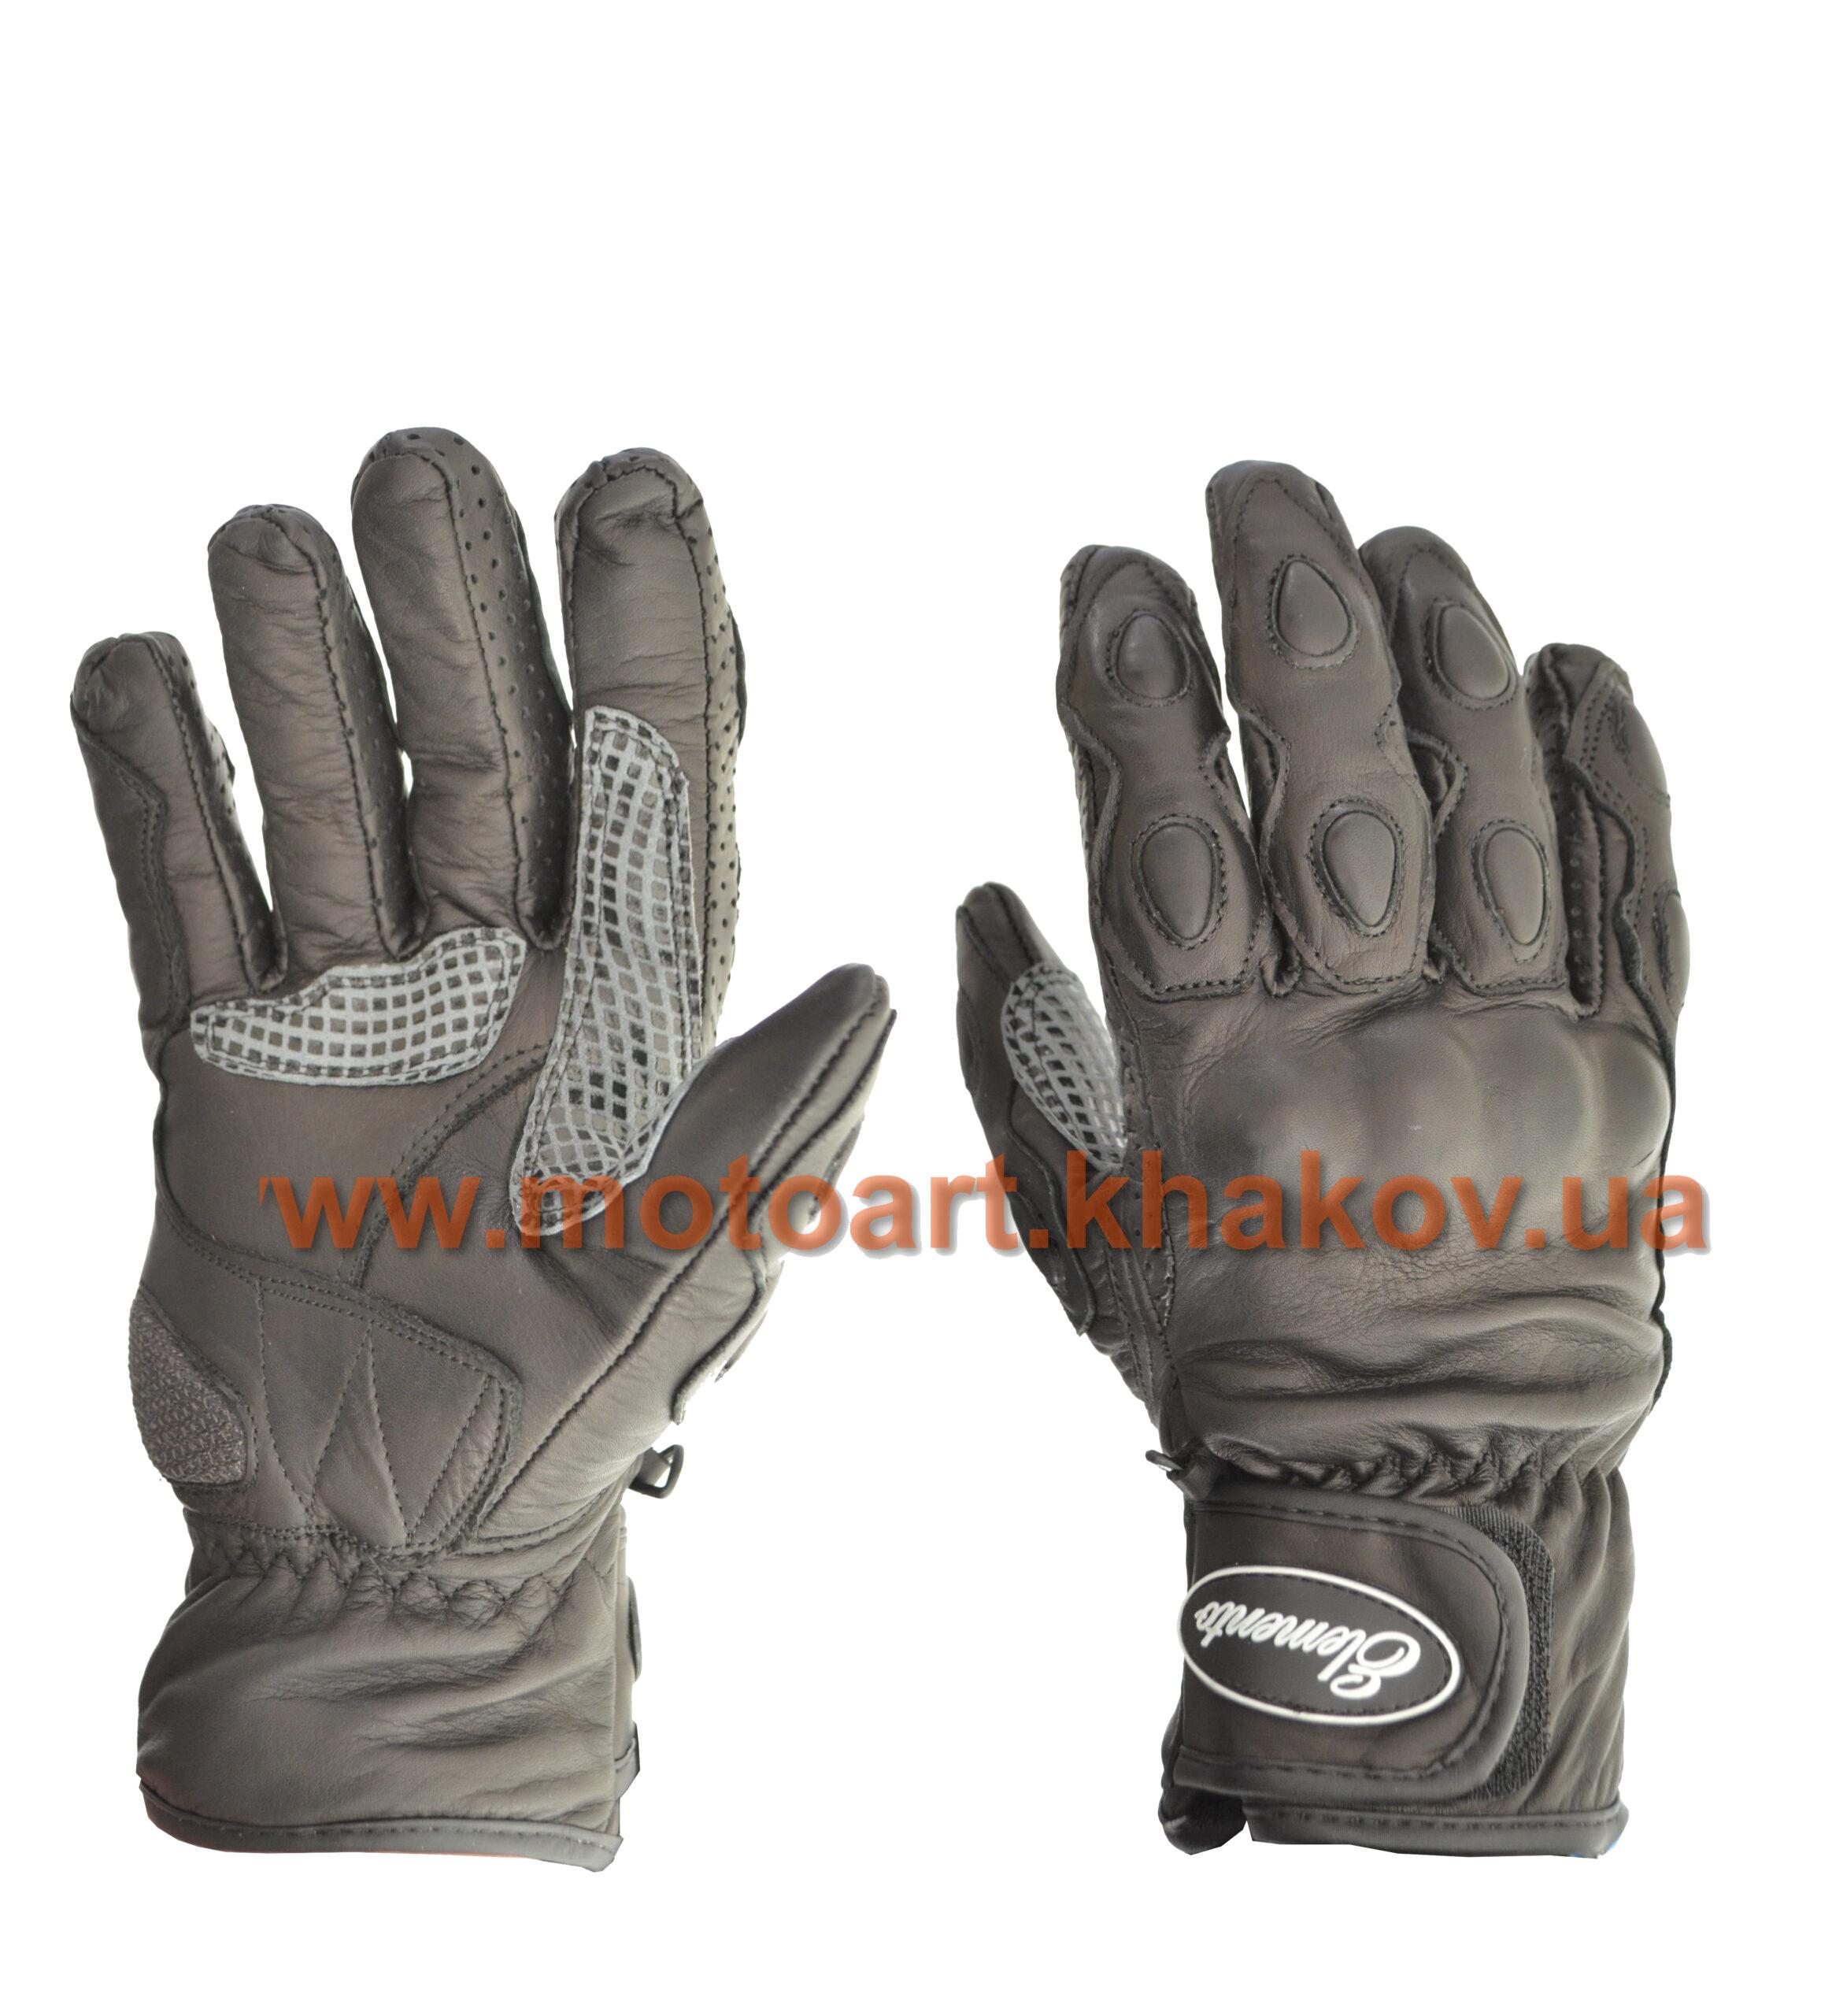 Мотоперчатки Elemento 175  Артмото - купить квадроцикл в украине и харькове, мотоцикл, снегоход, скутер, мопед, электромобиль